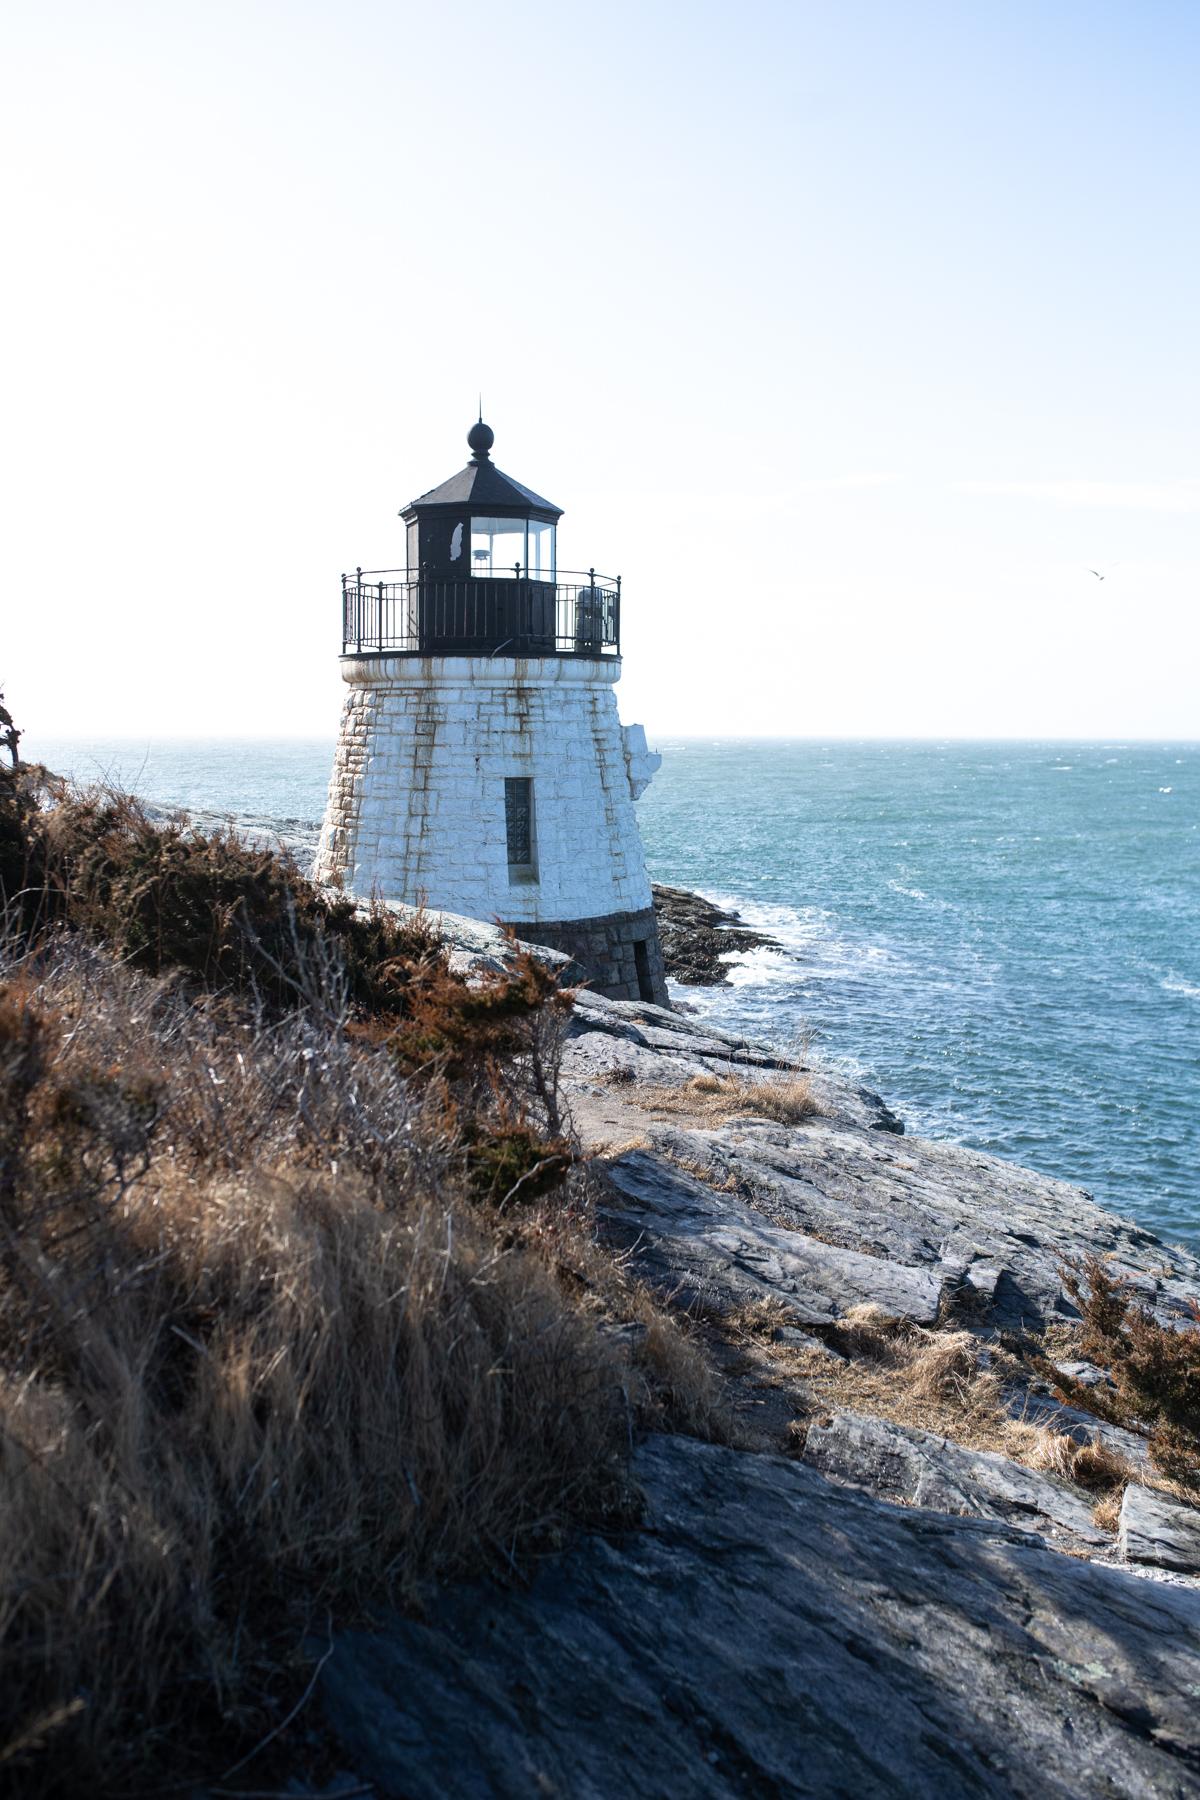 Newport%2C Rhode Island Weekend Travel Guide x Stacie Flinner-21.jpg